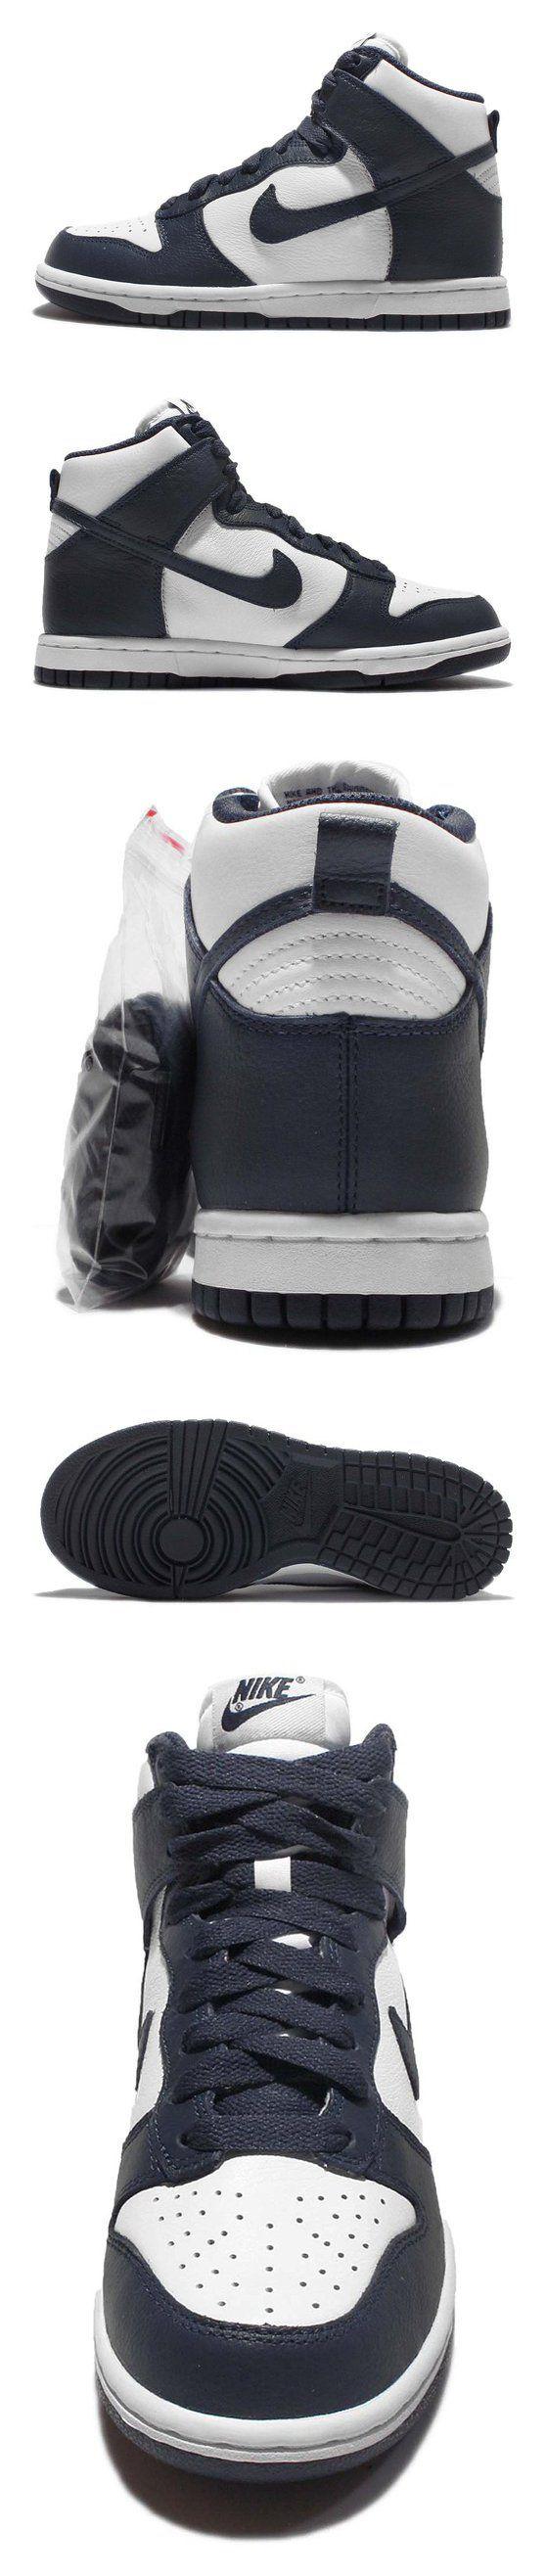 $203.6 - Nike Women's Wmns Dunk Retro QS  WHITE/MIDNIGHT NAVY #shoes #nike #2016